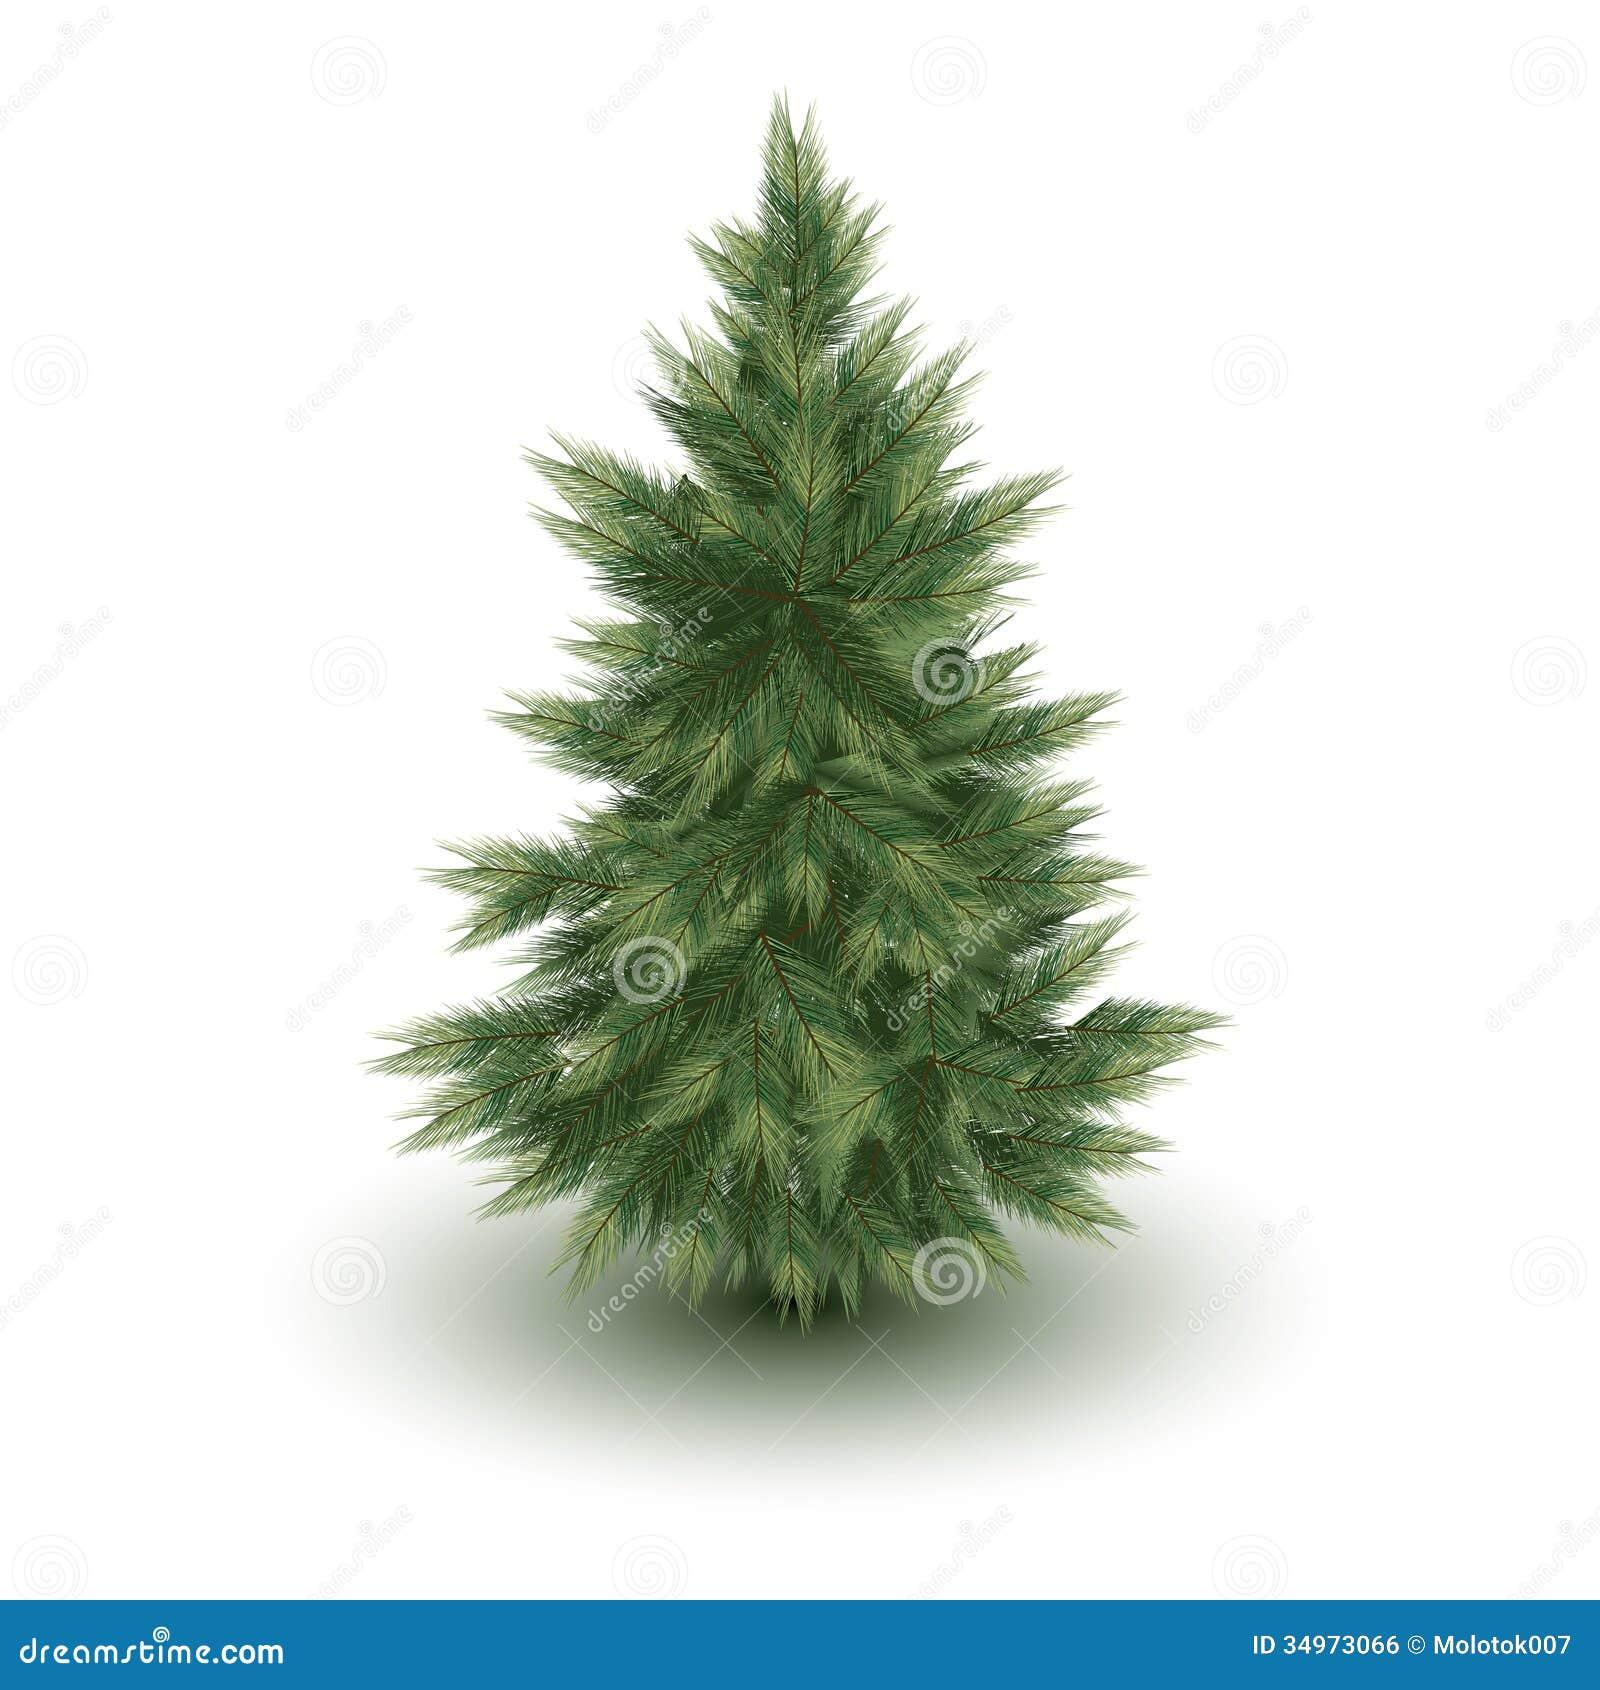 Christmas tree vector image royalty free stock image image 34973066 - Royalty Free Stock Photo Christmas Pine Tree Vector